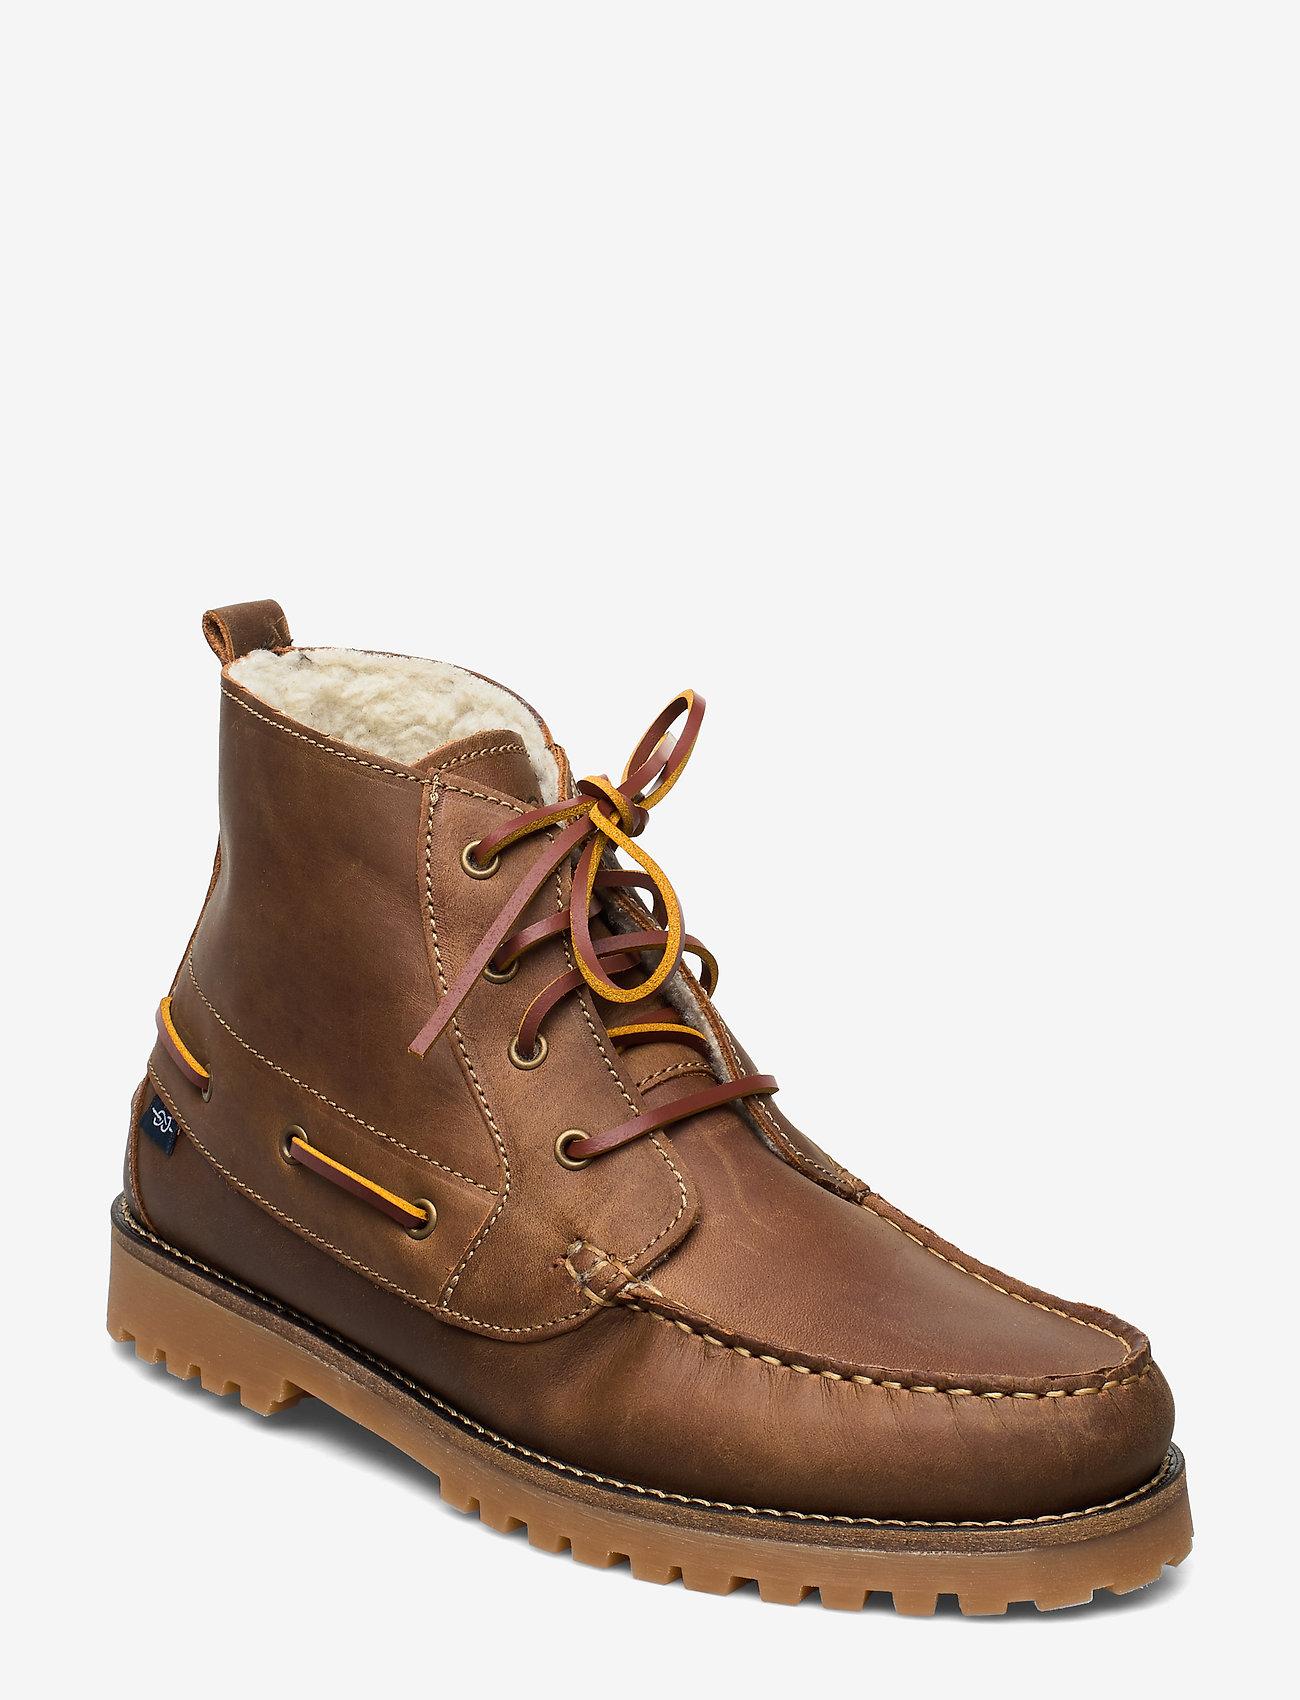 Marstrand - ROUGH 4-EYE WARM MARSTRAND KÄNGA - vinter boots - taupe - 0